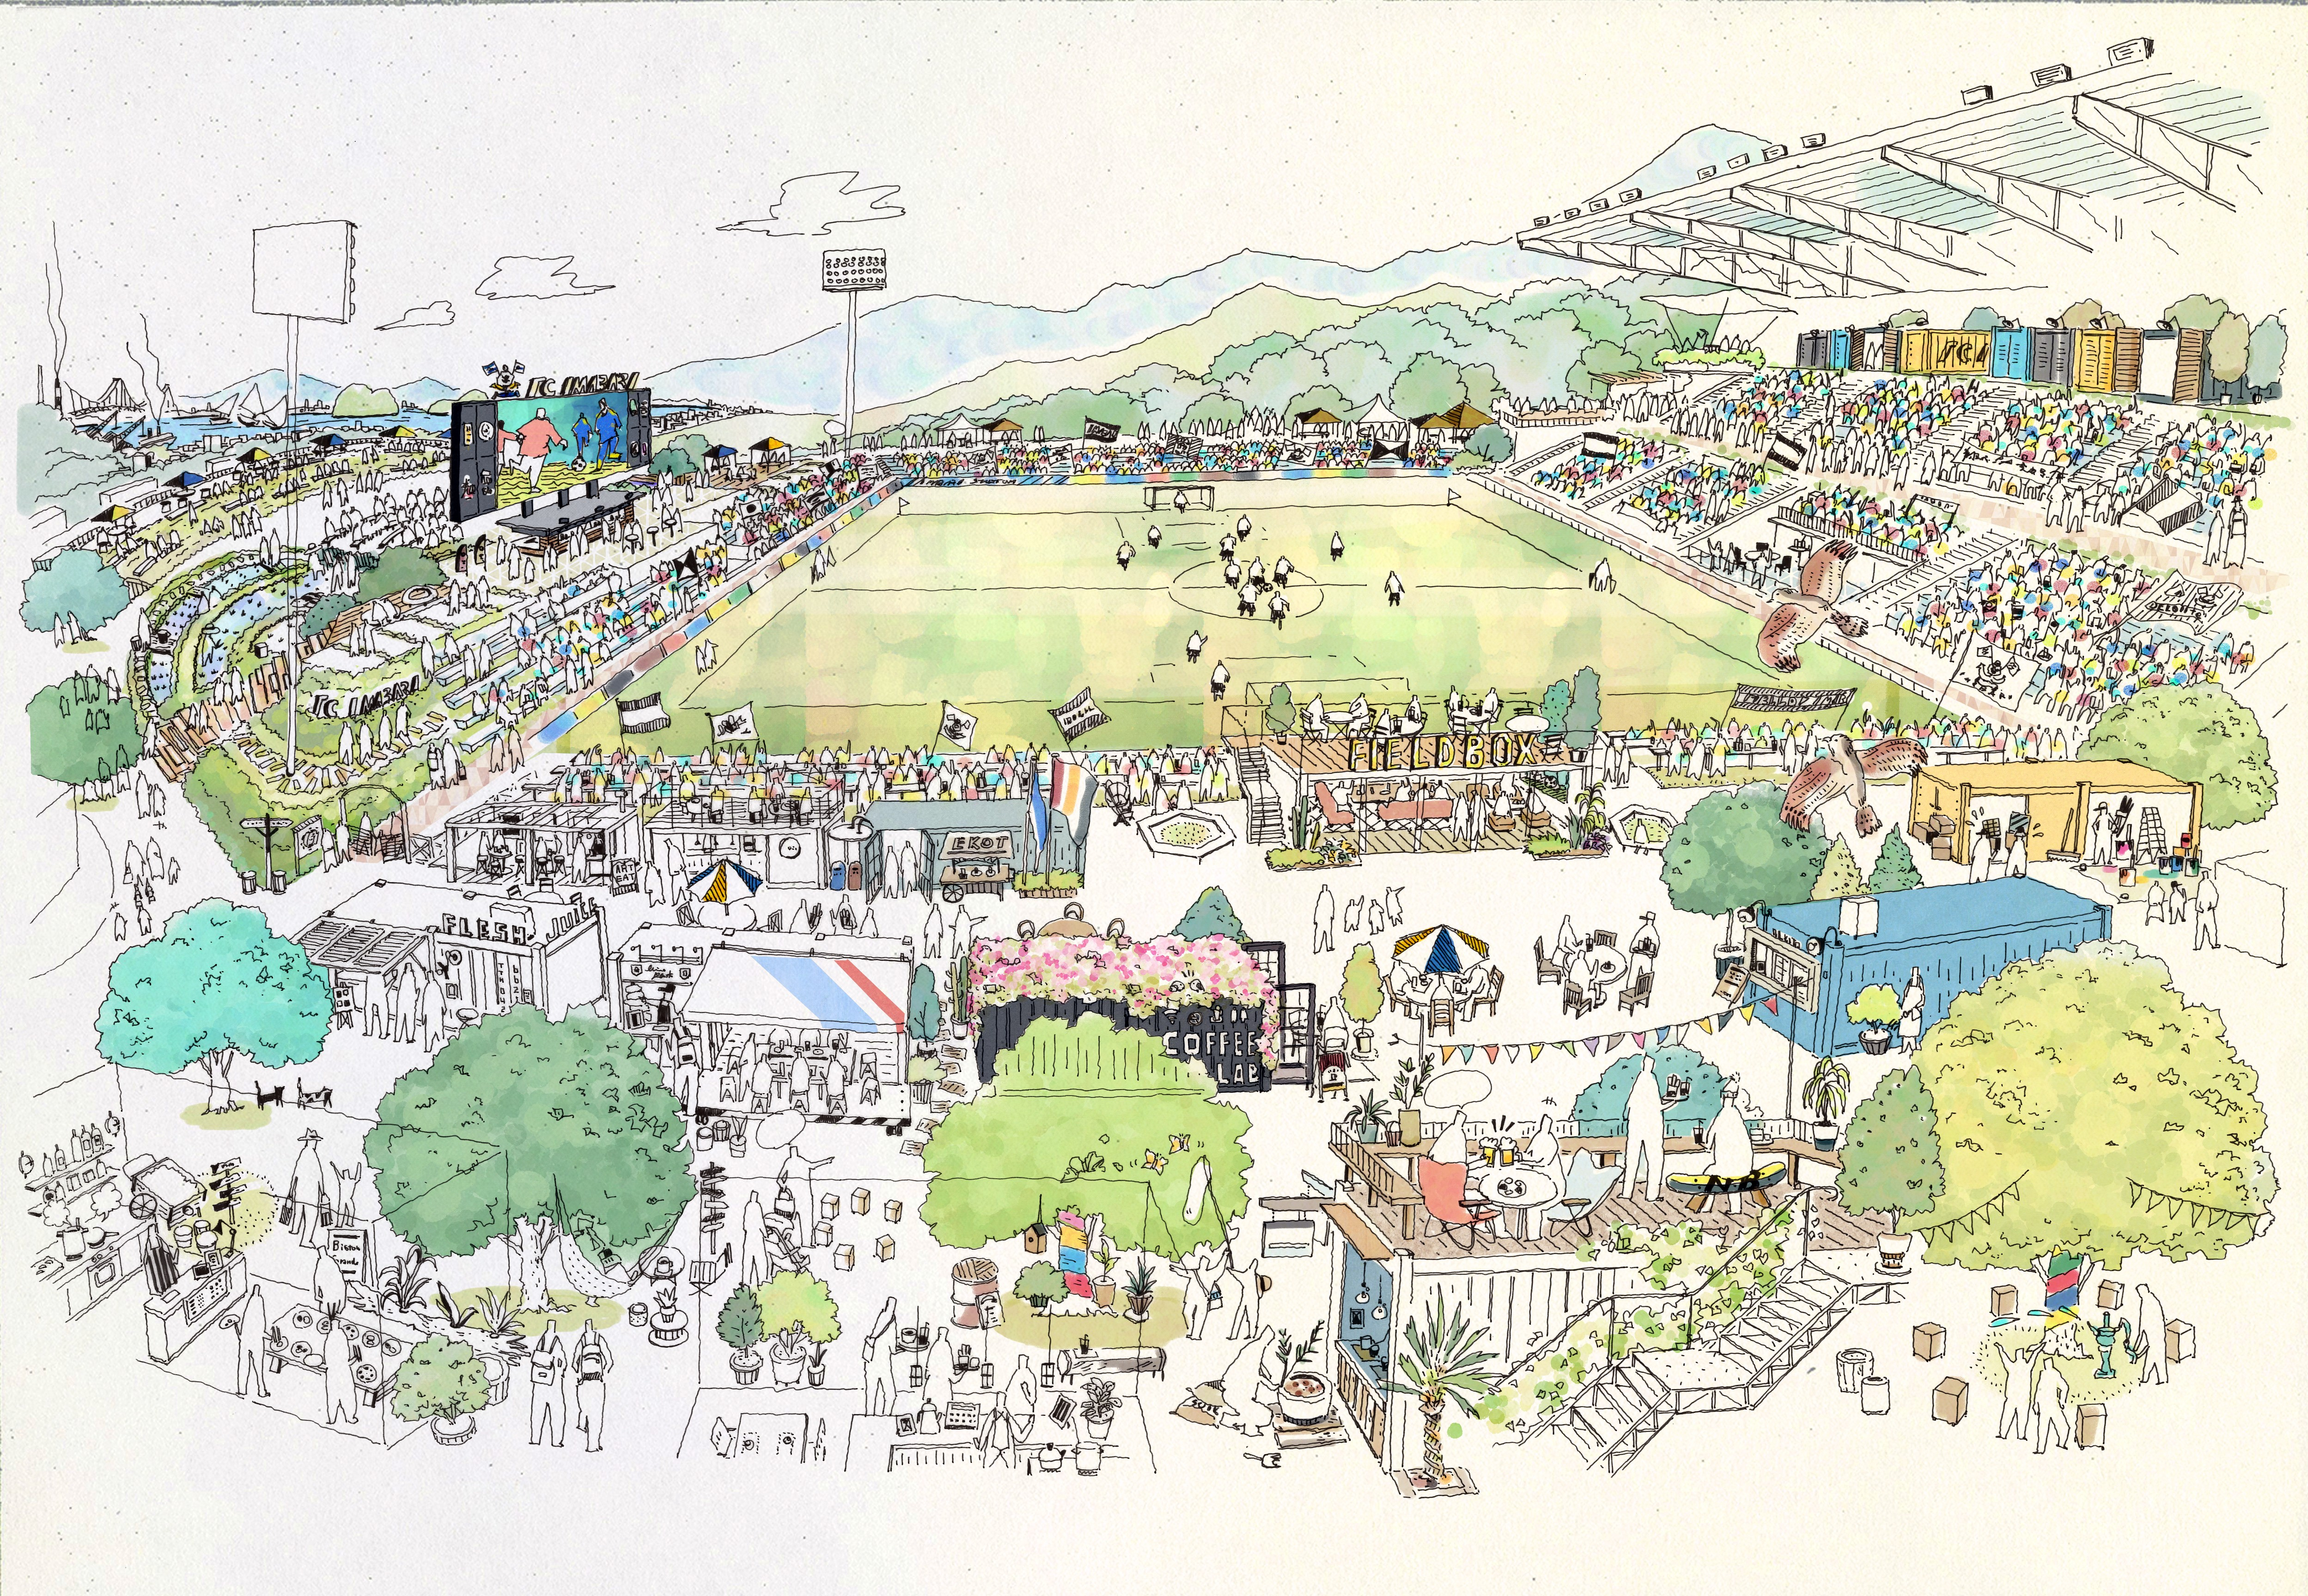 20200127_stadium2.jpg